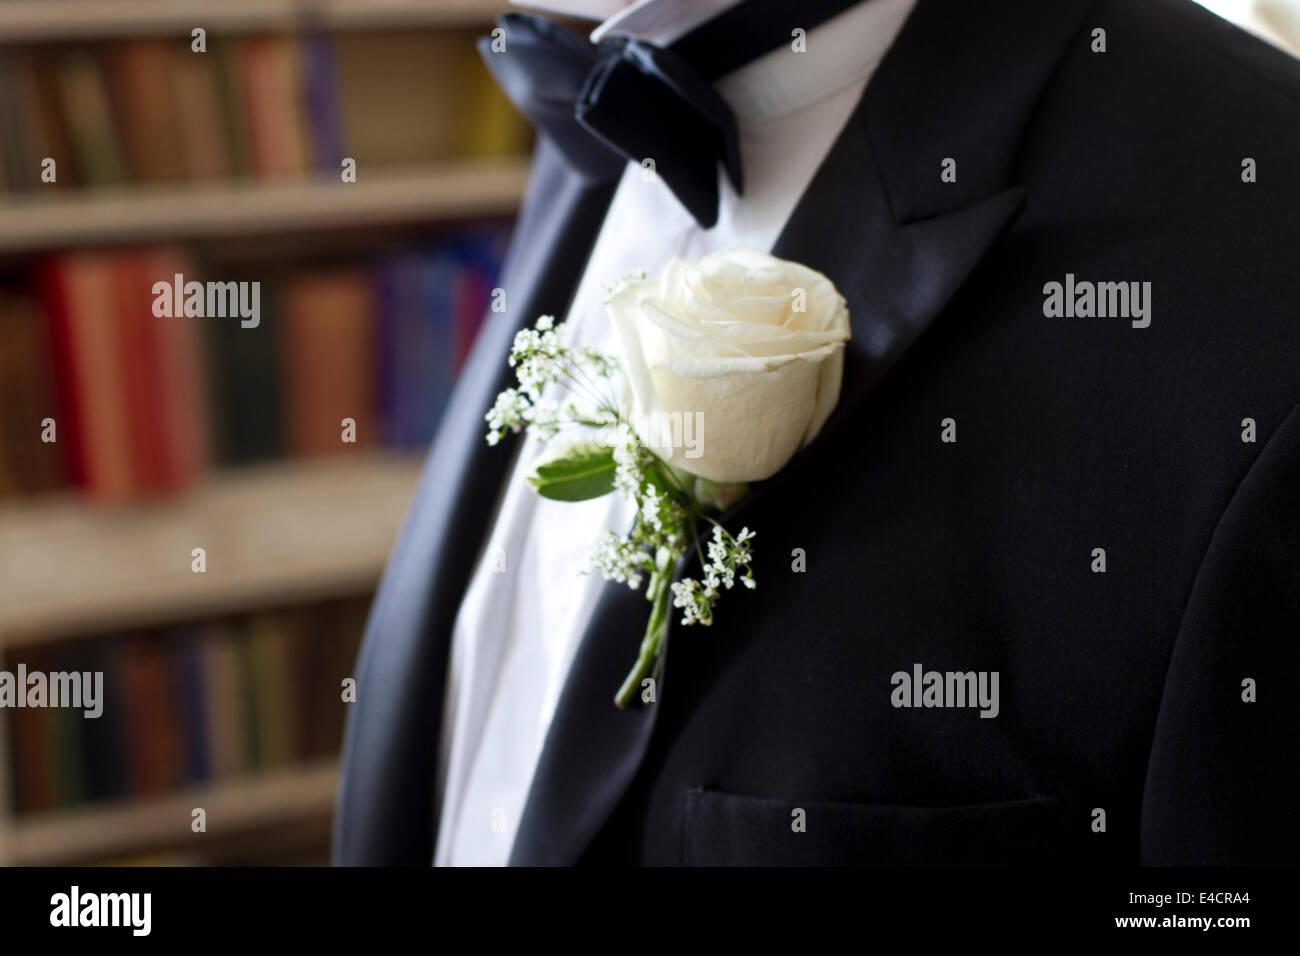 Wedding preparations, Tuxedo, bow tie, buttonhole, Dorset, England - Stock Image